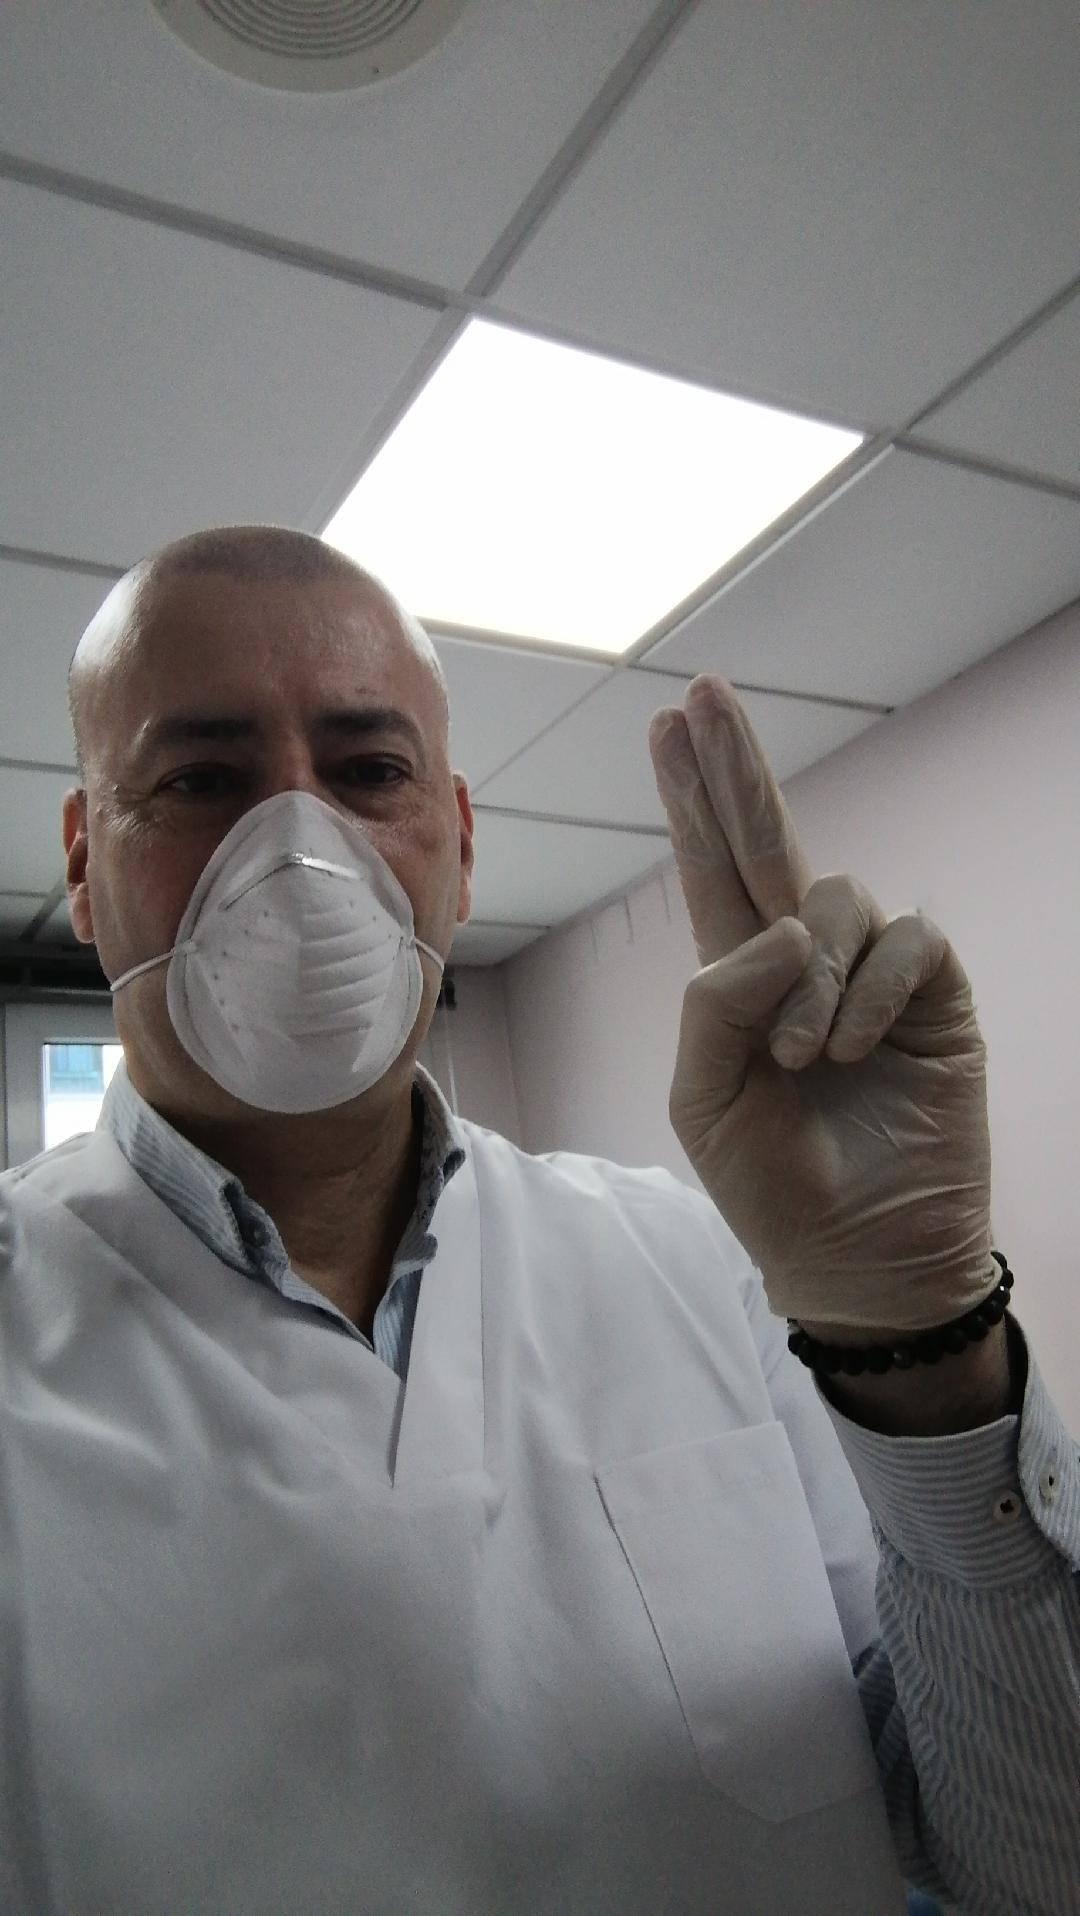 Centro Médico Andrea Regina (Algeciras)